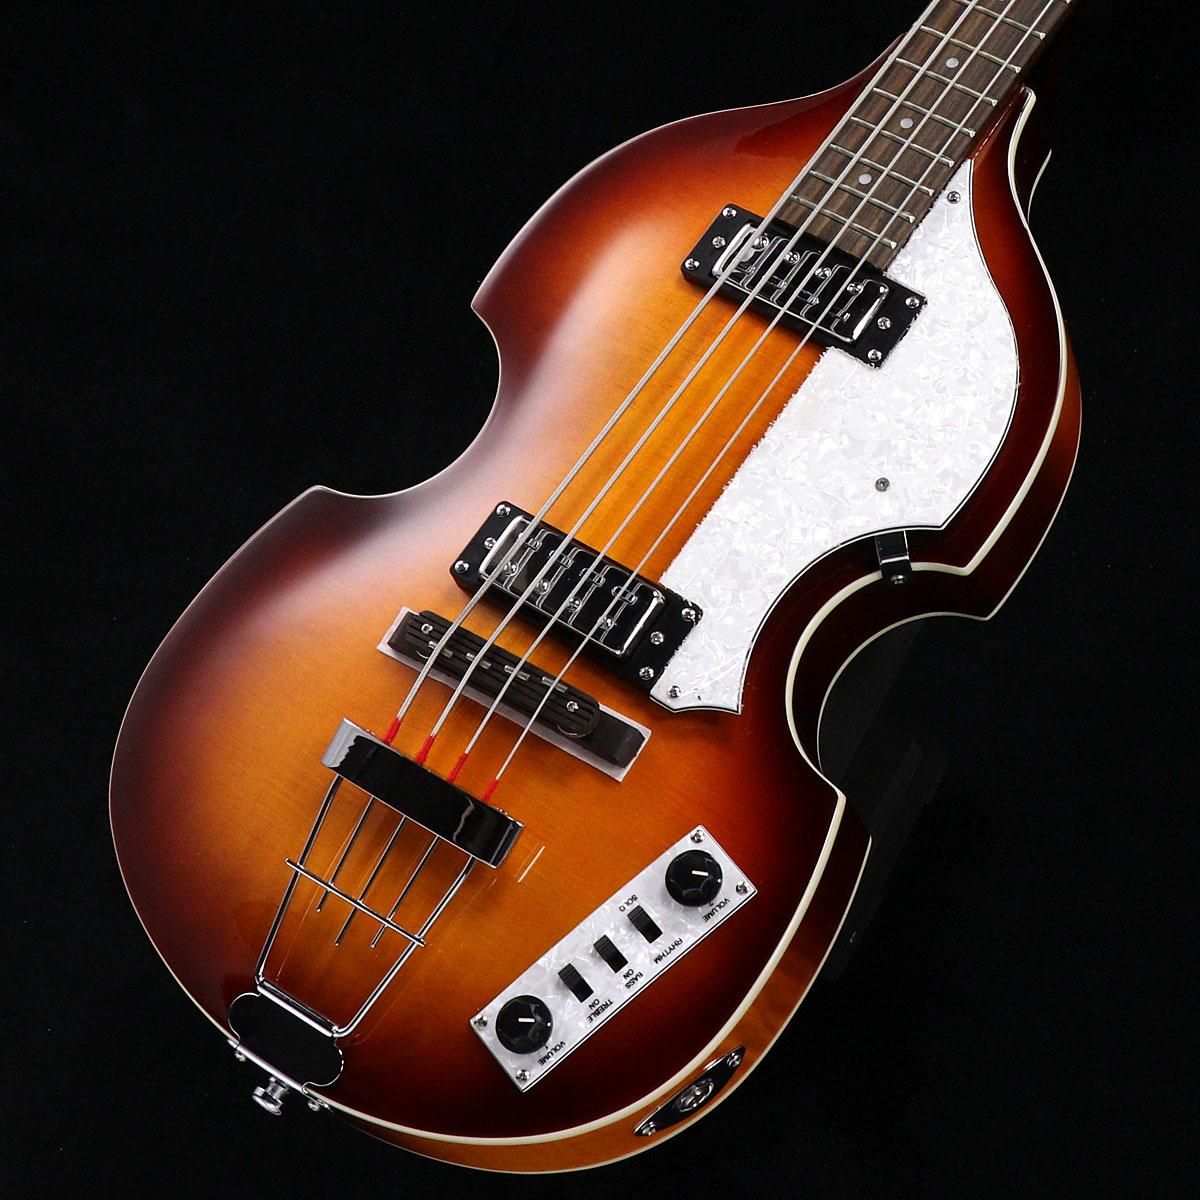 Hofner Ignition Bass Sunburst SB 渋谷店 お見舞 開店祝 月末バーゲンセール 金婚式 プライバシーポリシー ハロウィン